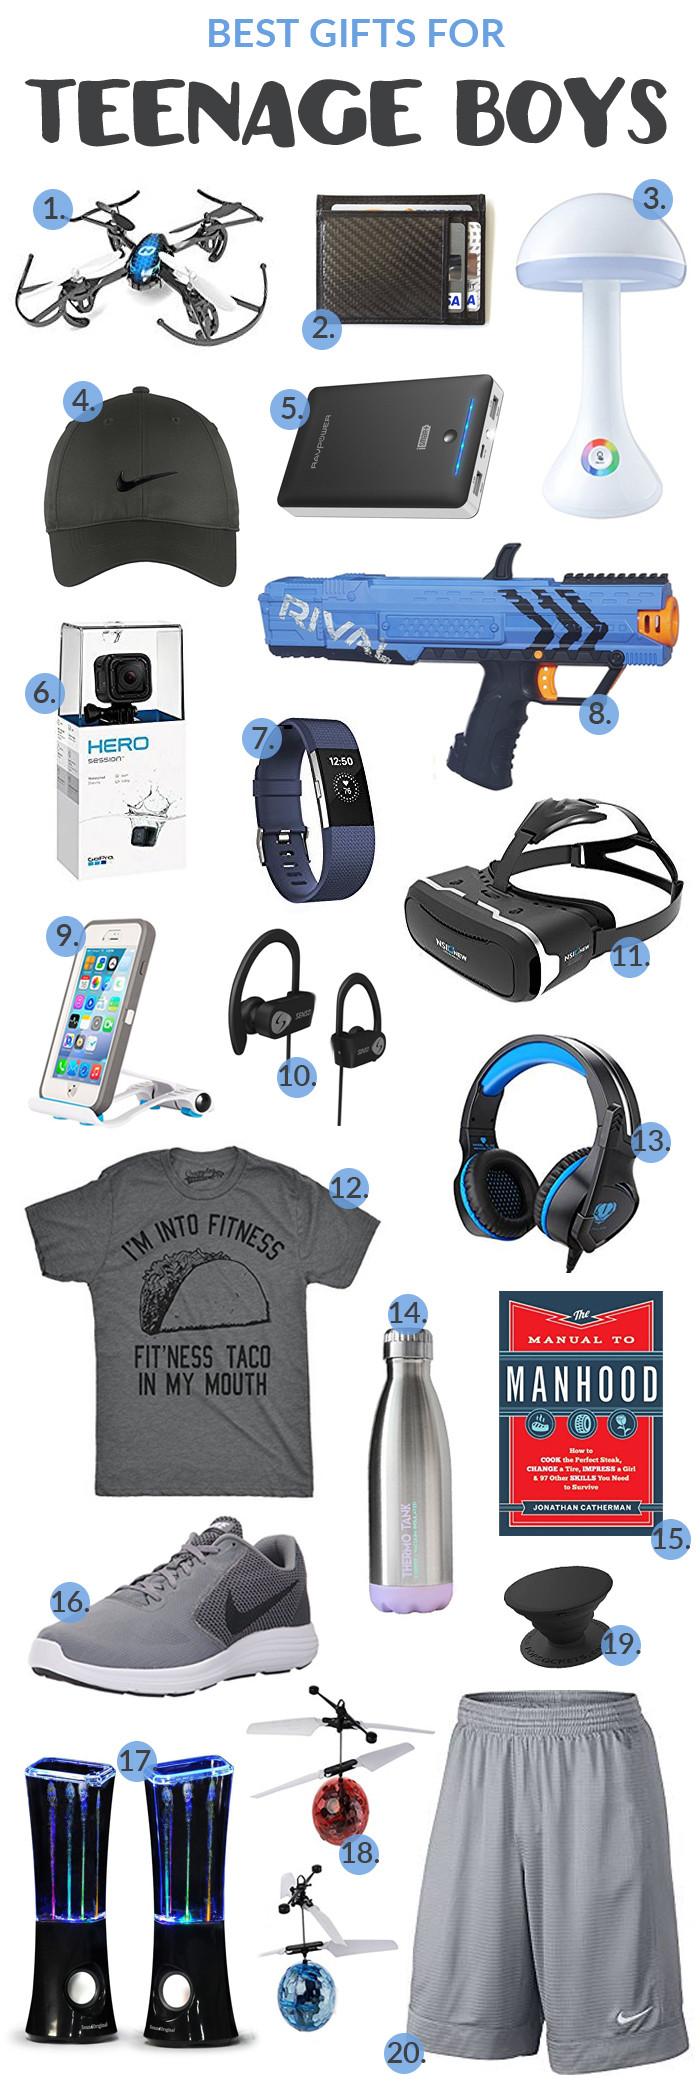 Gift Ideas For Teen Boyfriend  Best Gifts for Teenage Boys